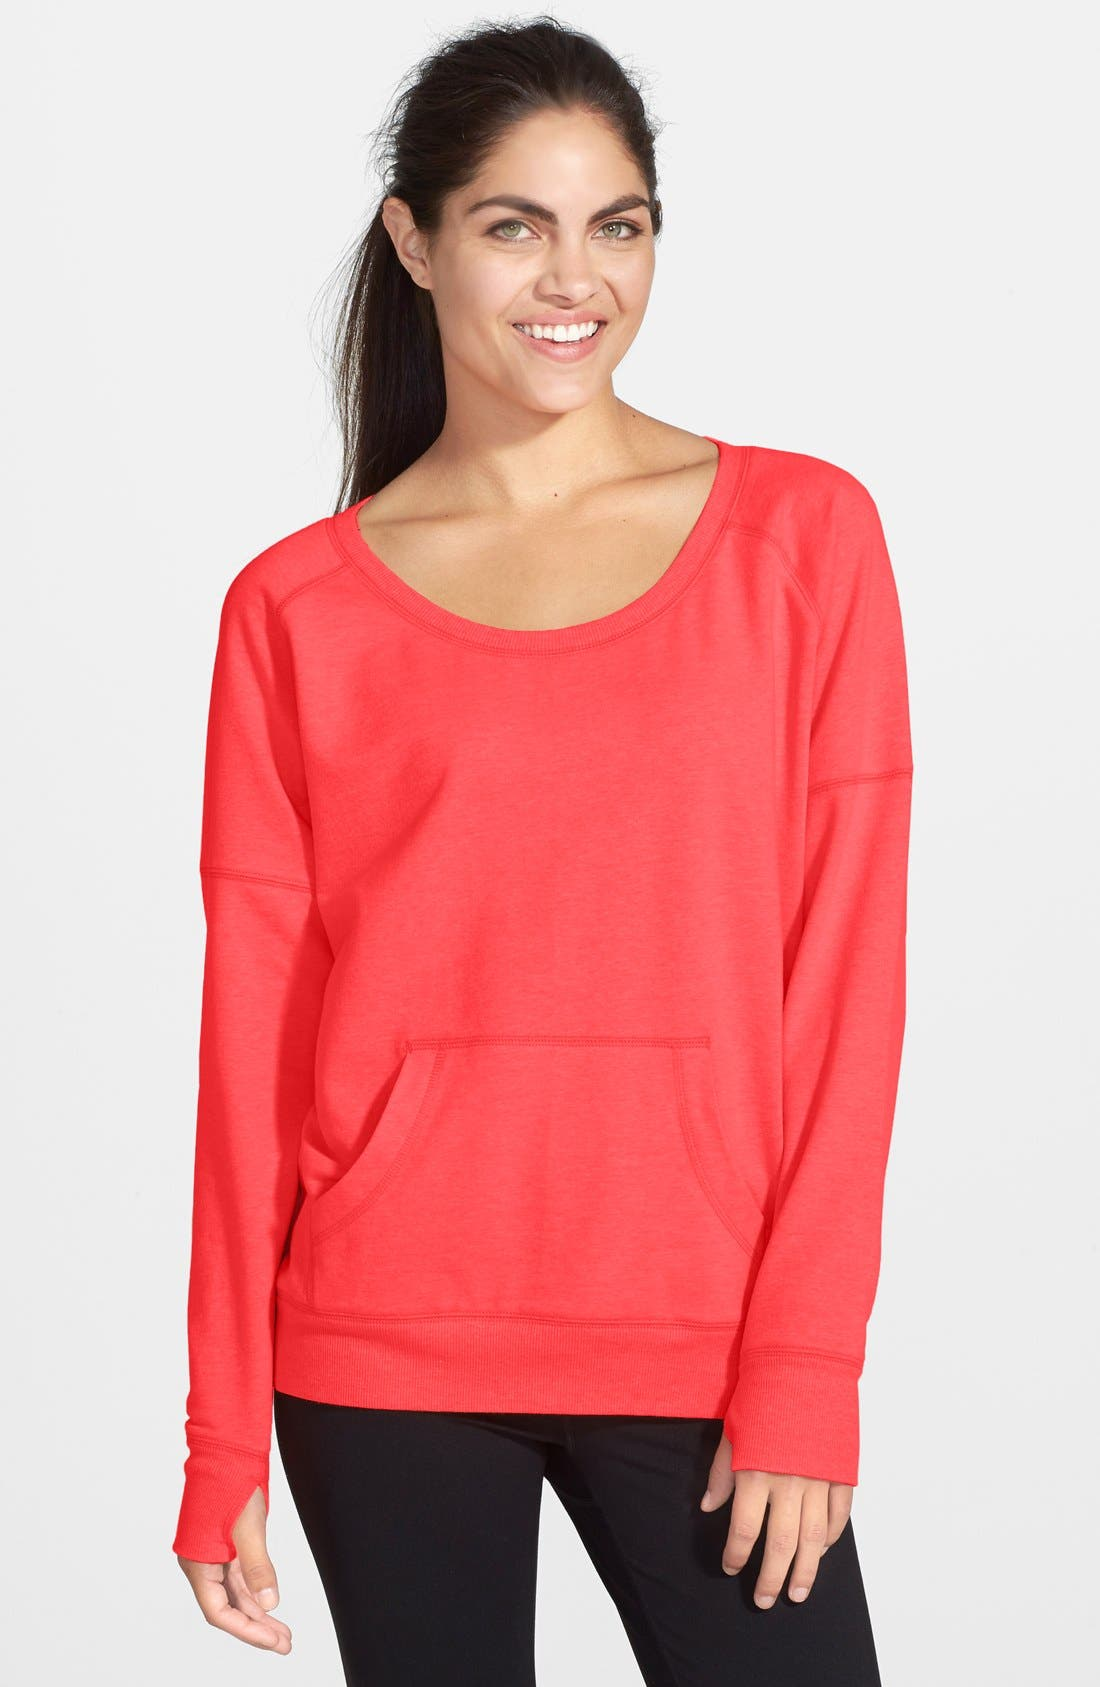 Alternate Image 1 Selected - Zella 'Heart It' French Terry Sweatshirt